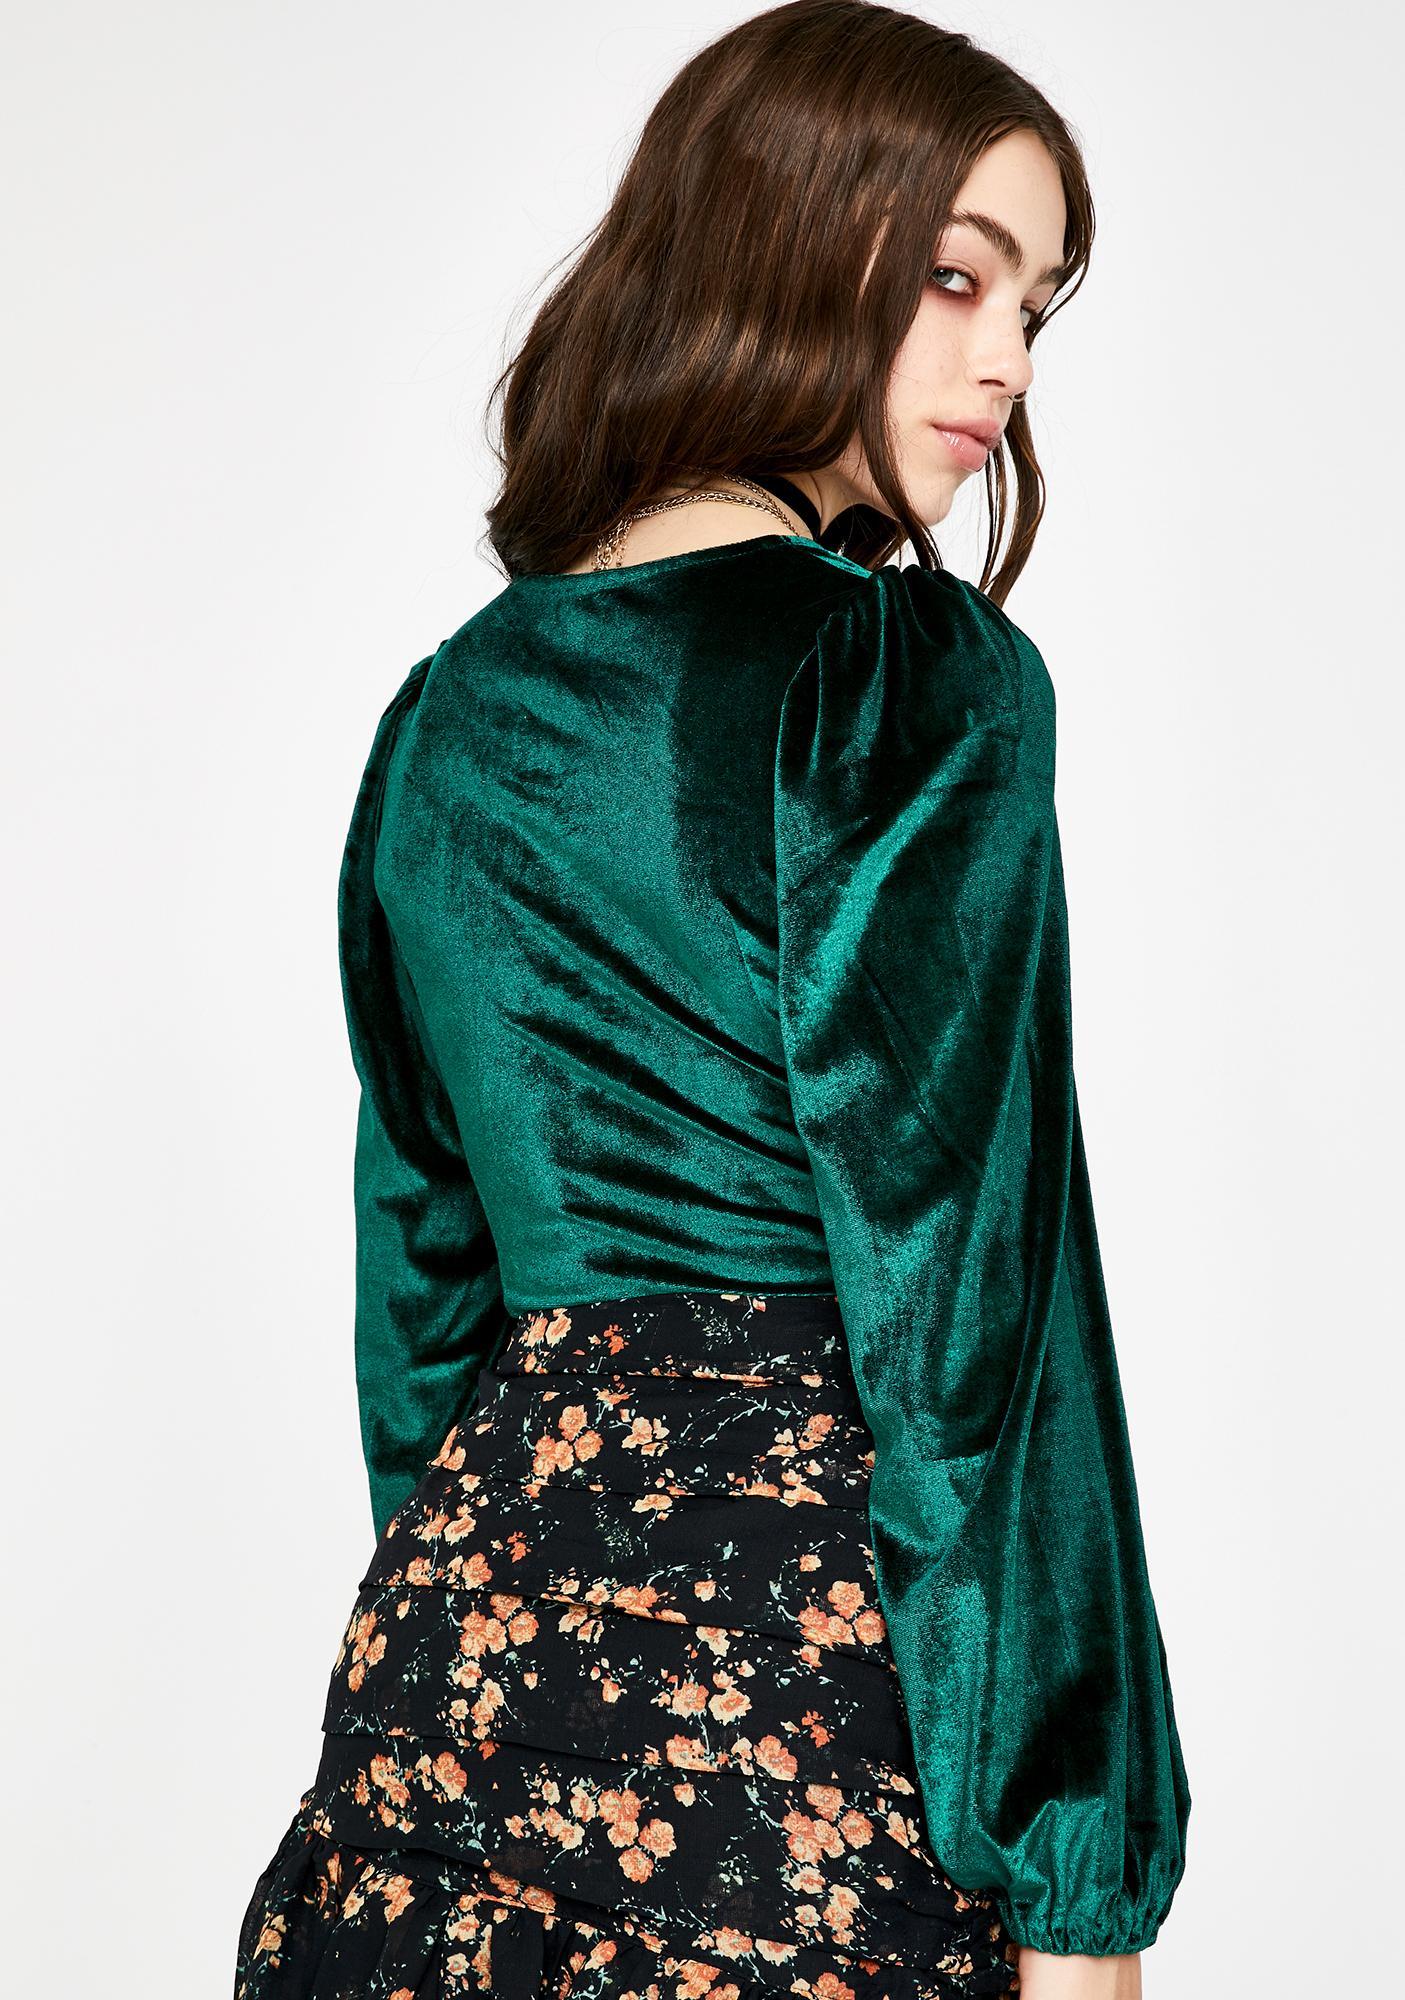 Seven Wonders Emerald Bellamy Long Sleeve Top